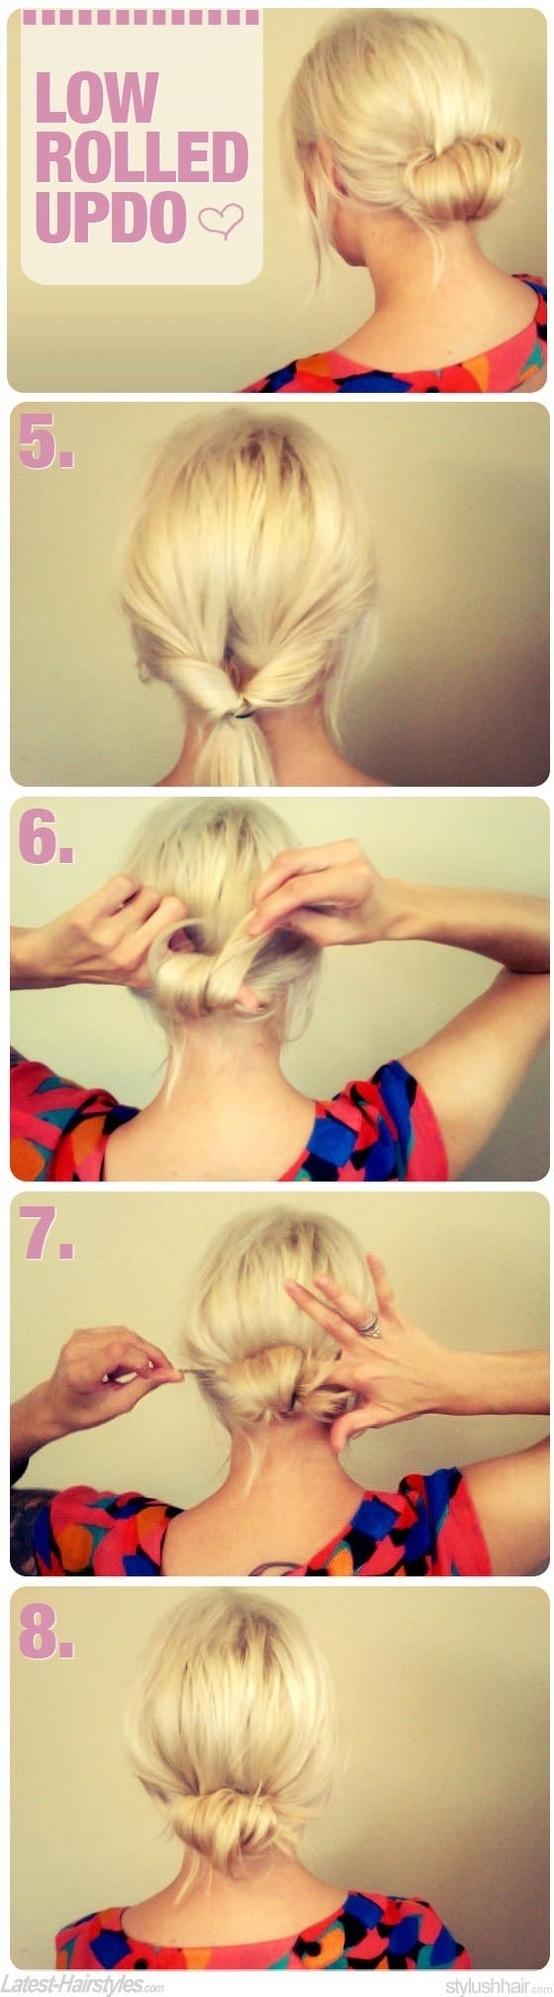 Up hair dew hair styles pinterest hair makeup hair style and